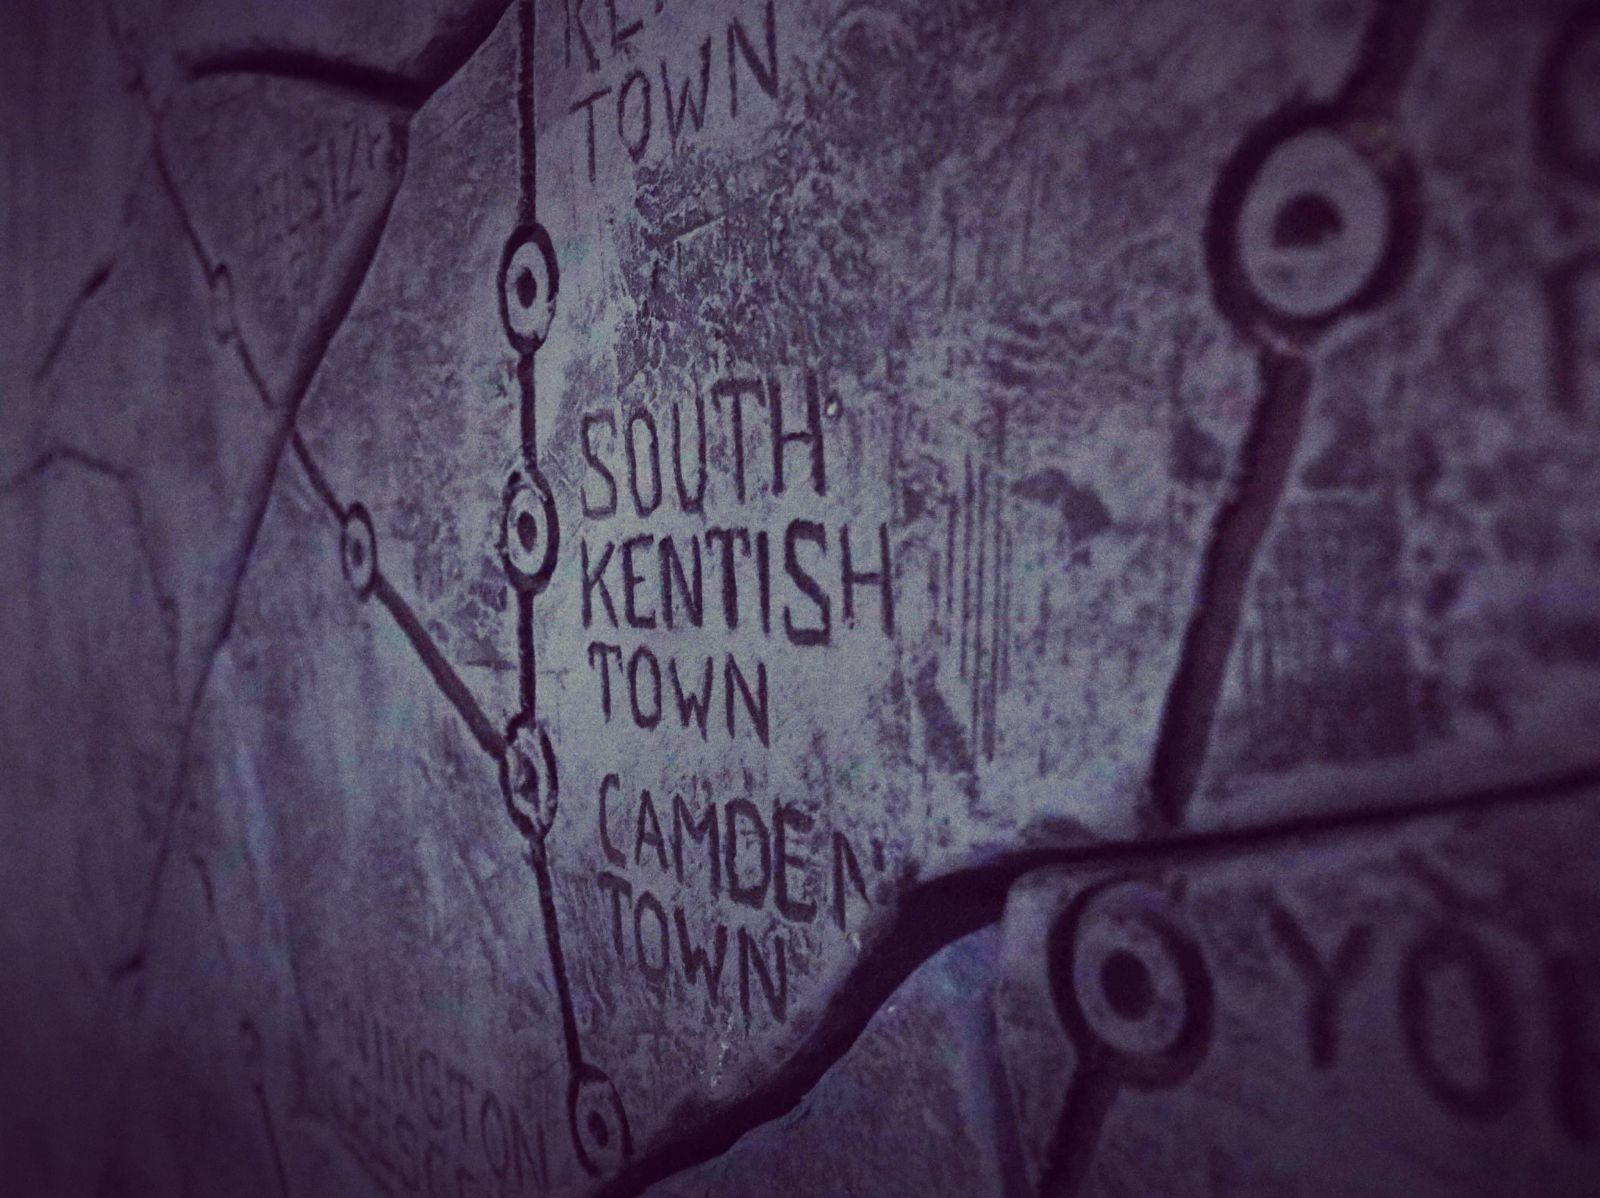 South kentish town Lost Passenger